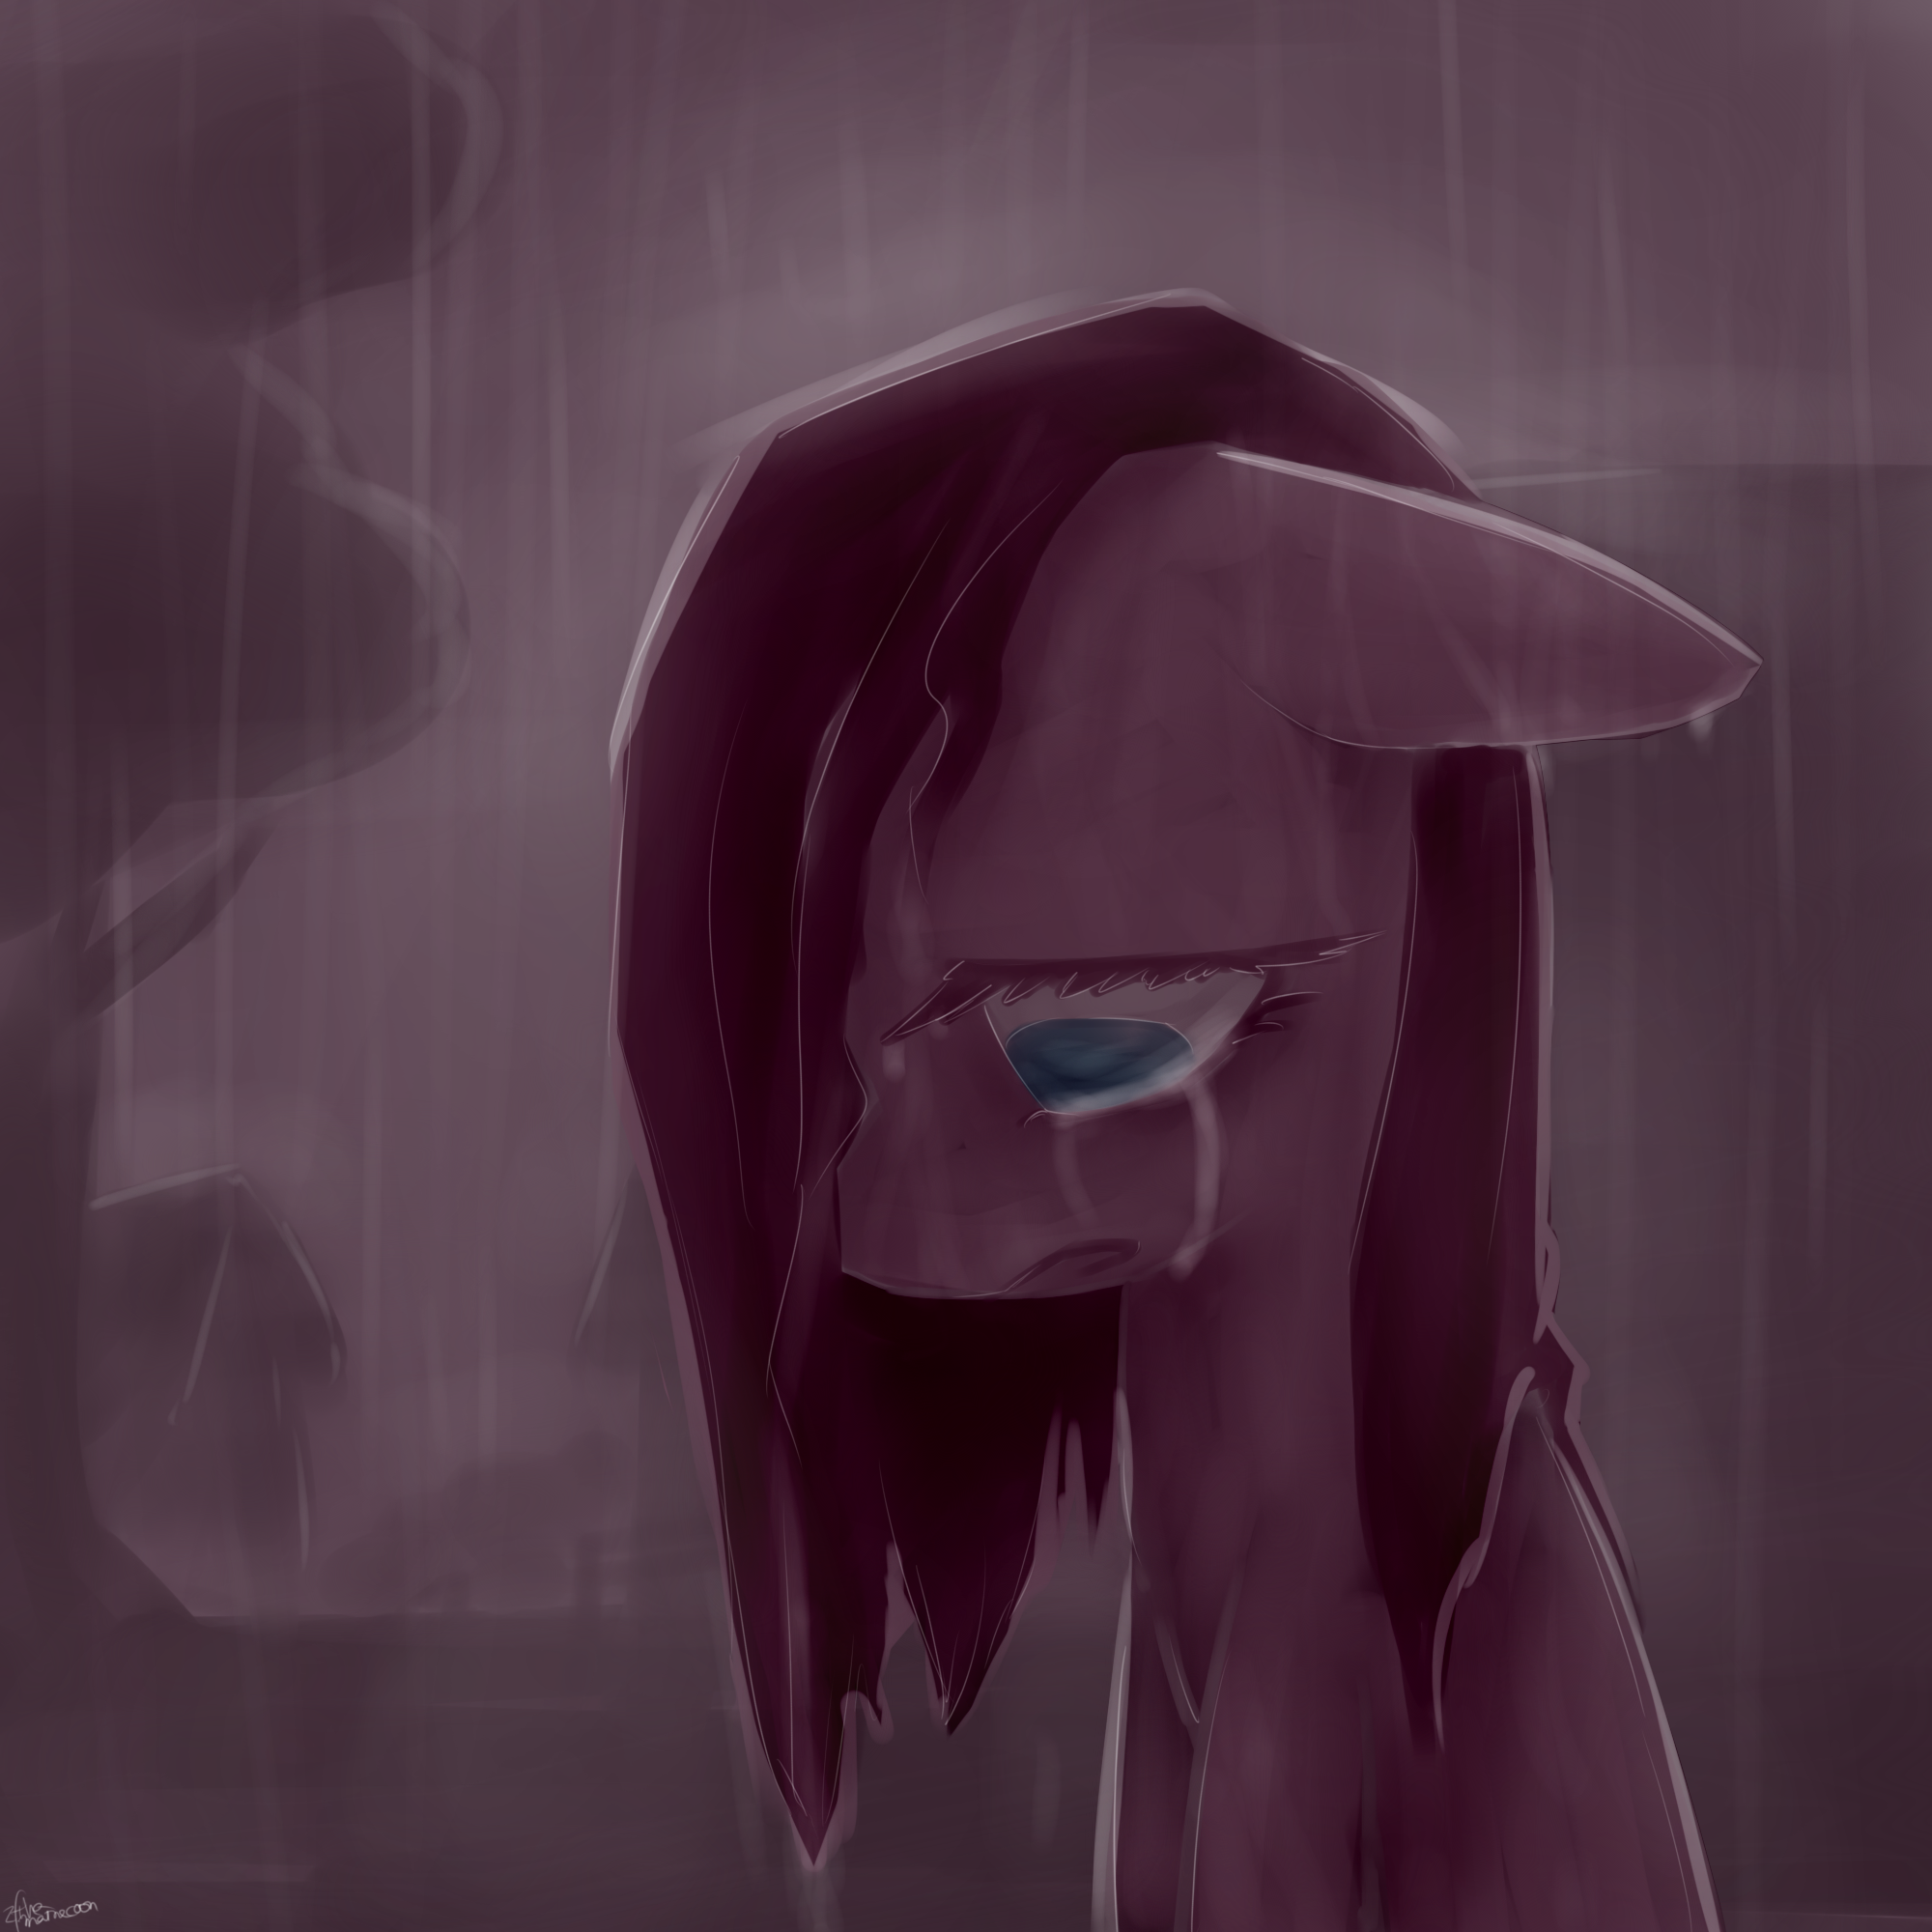 Pinkamena Cry By Ifthemainecoon Deviantart Com On